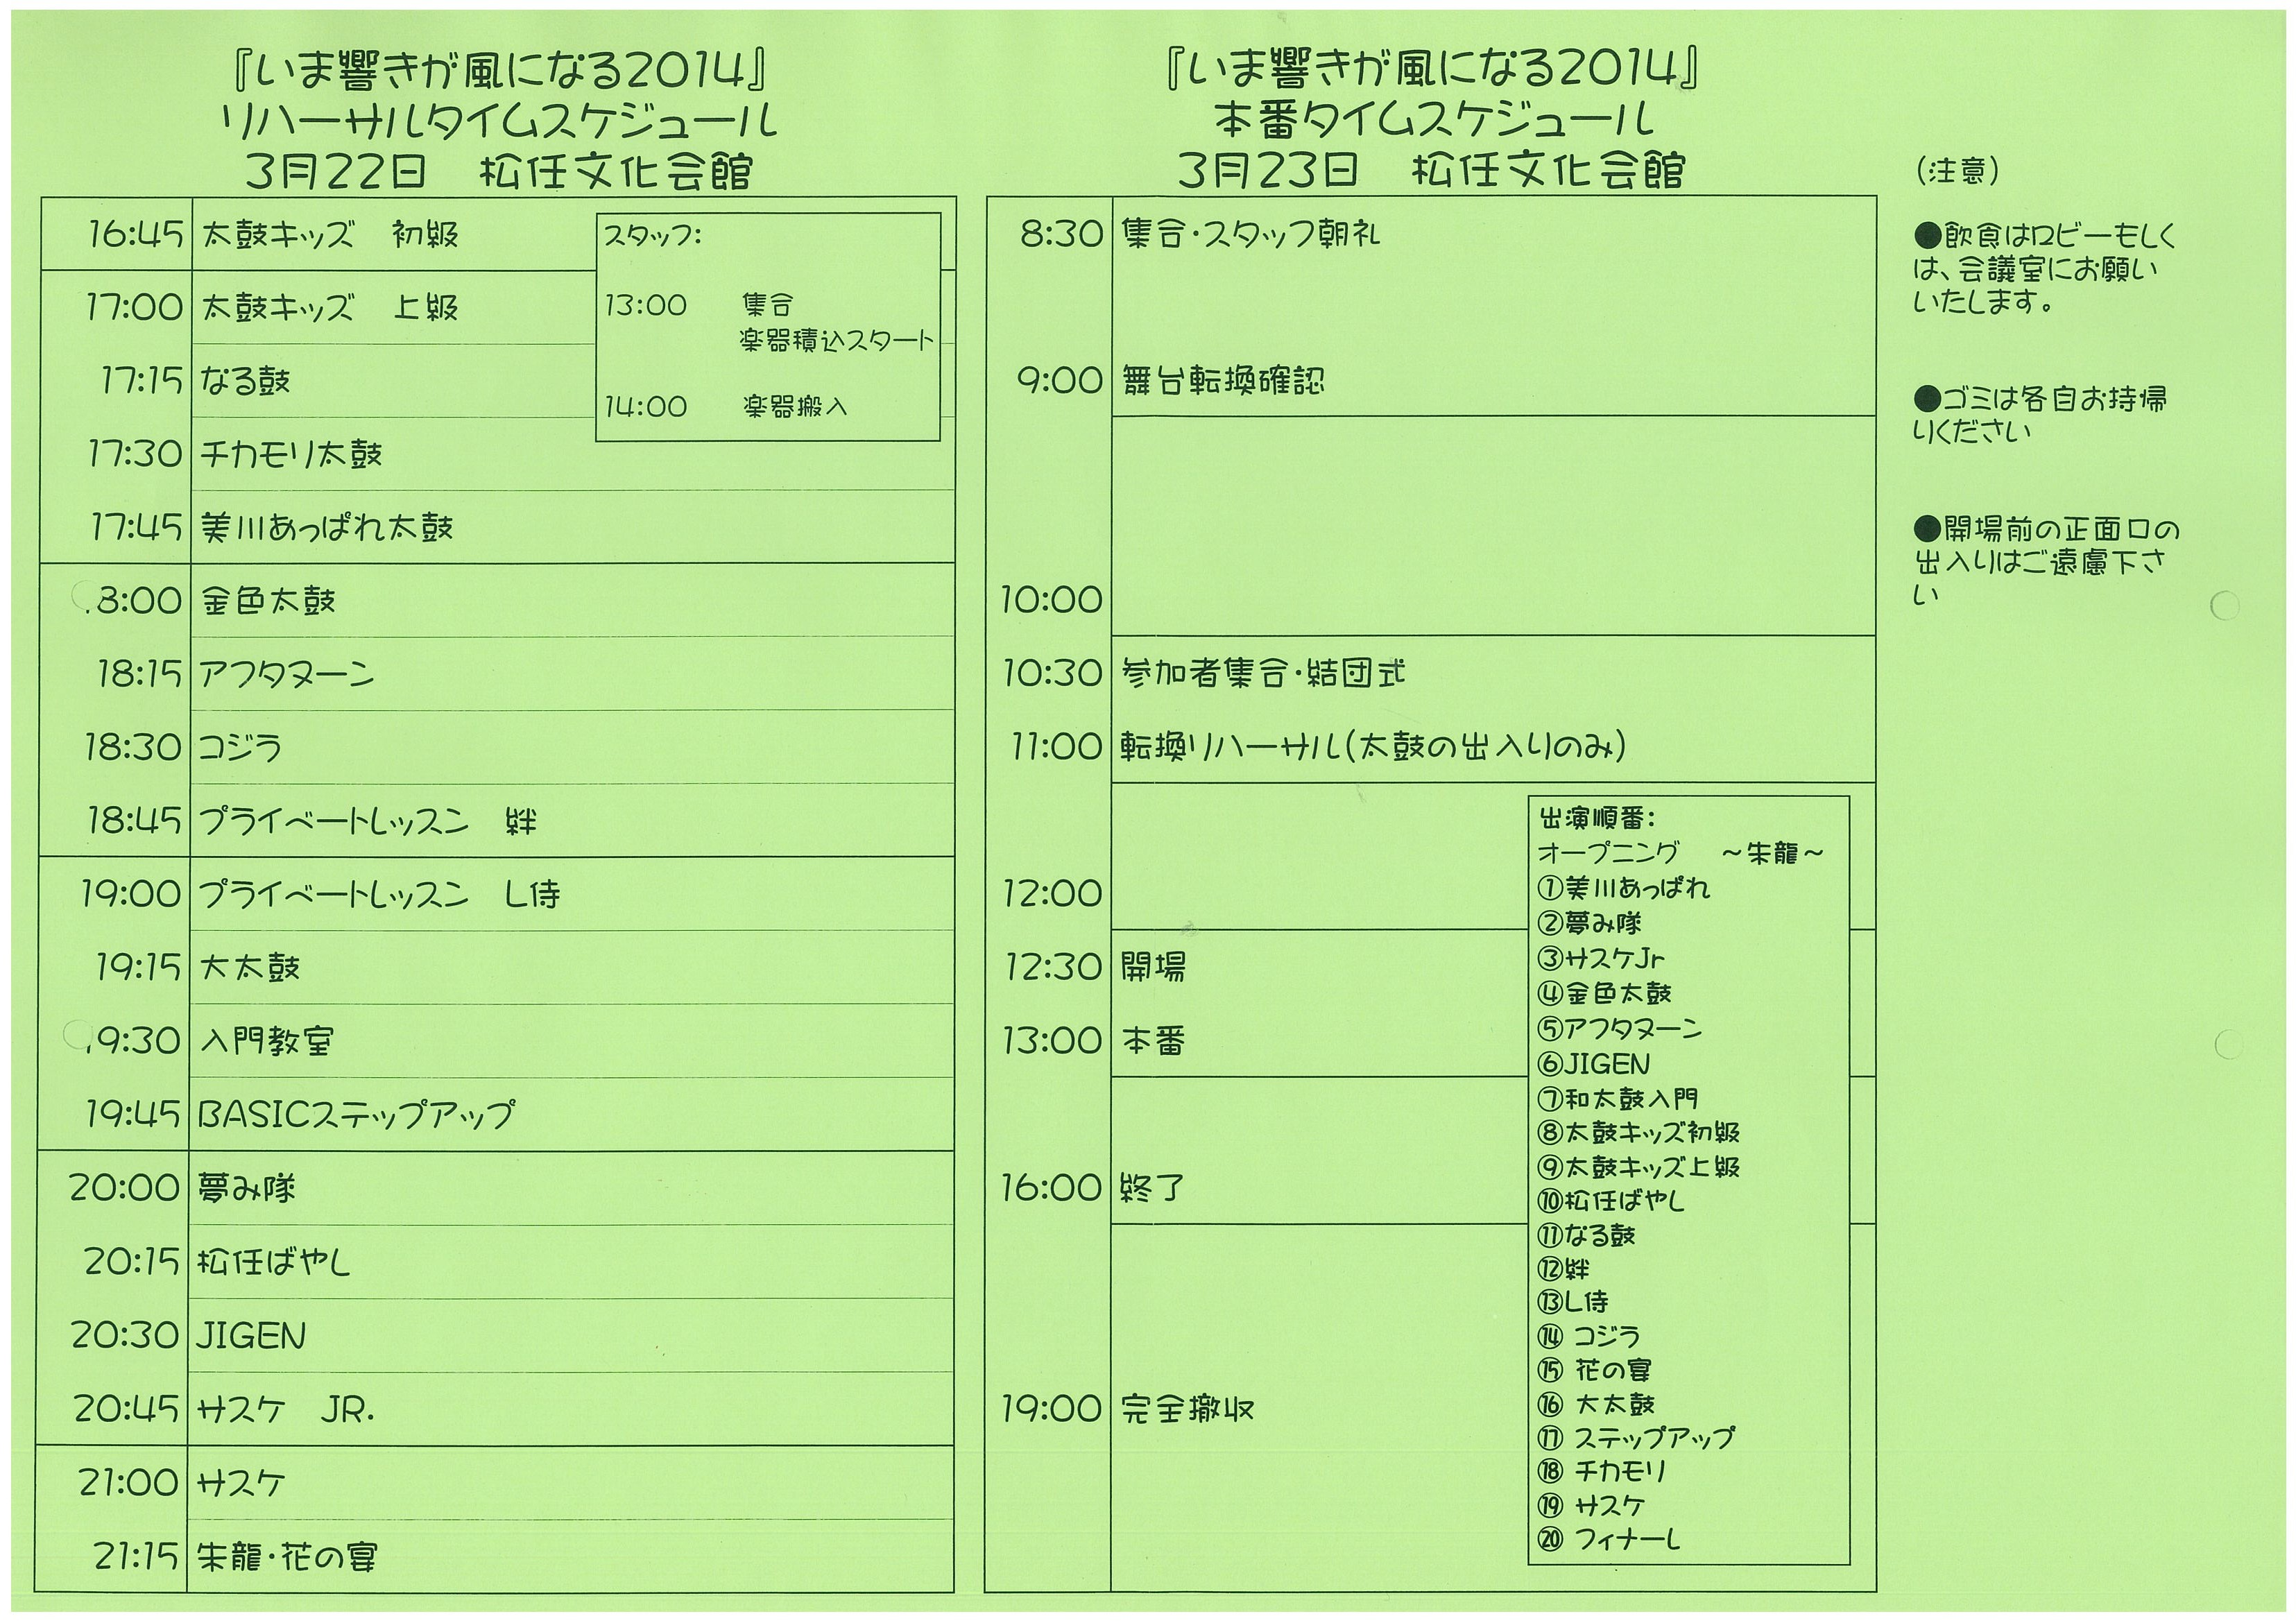 http://www.asano.jp/network/img-320113059-0001.jpg